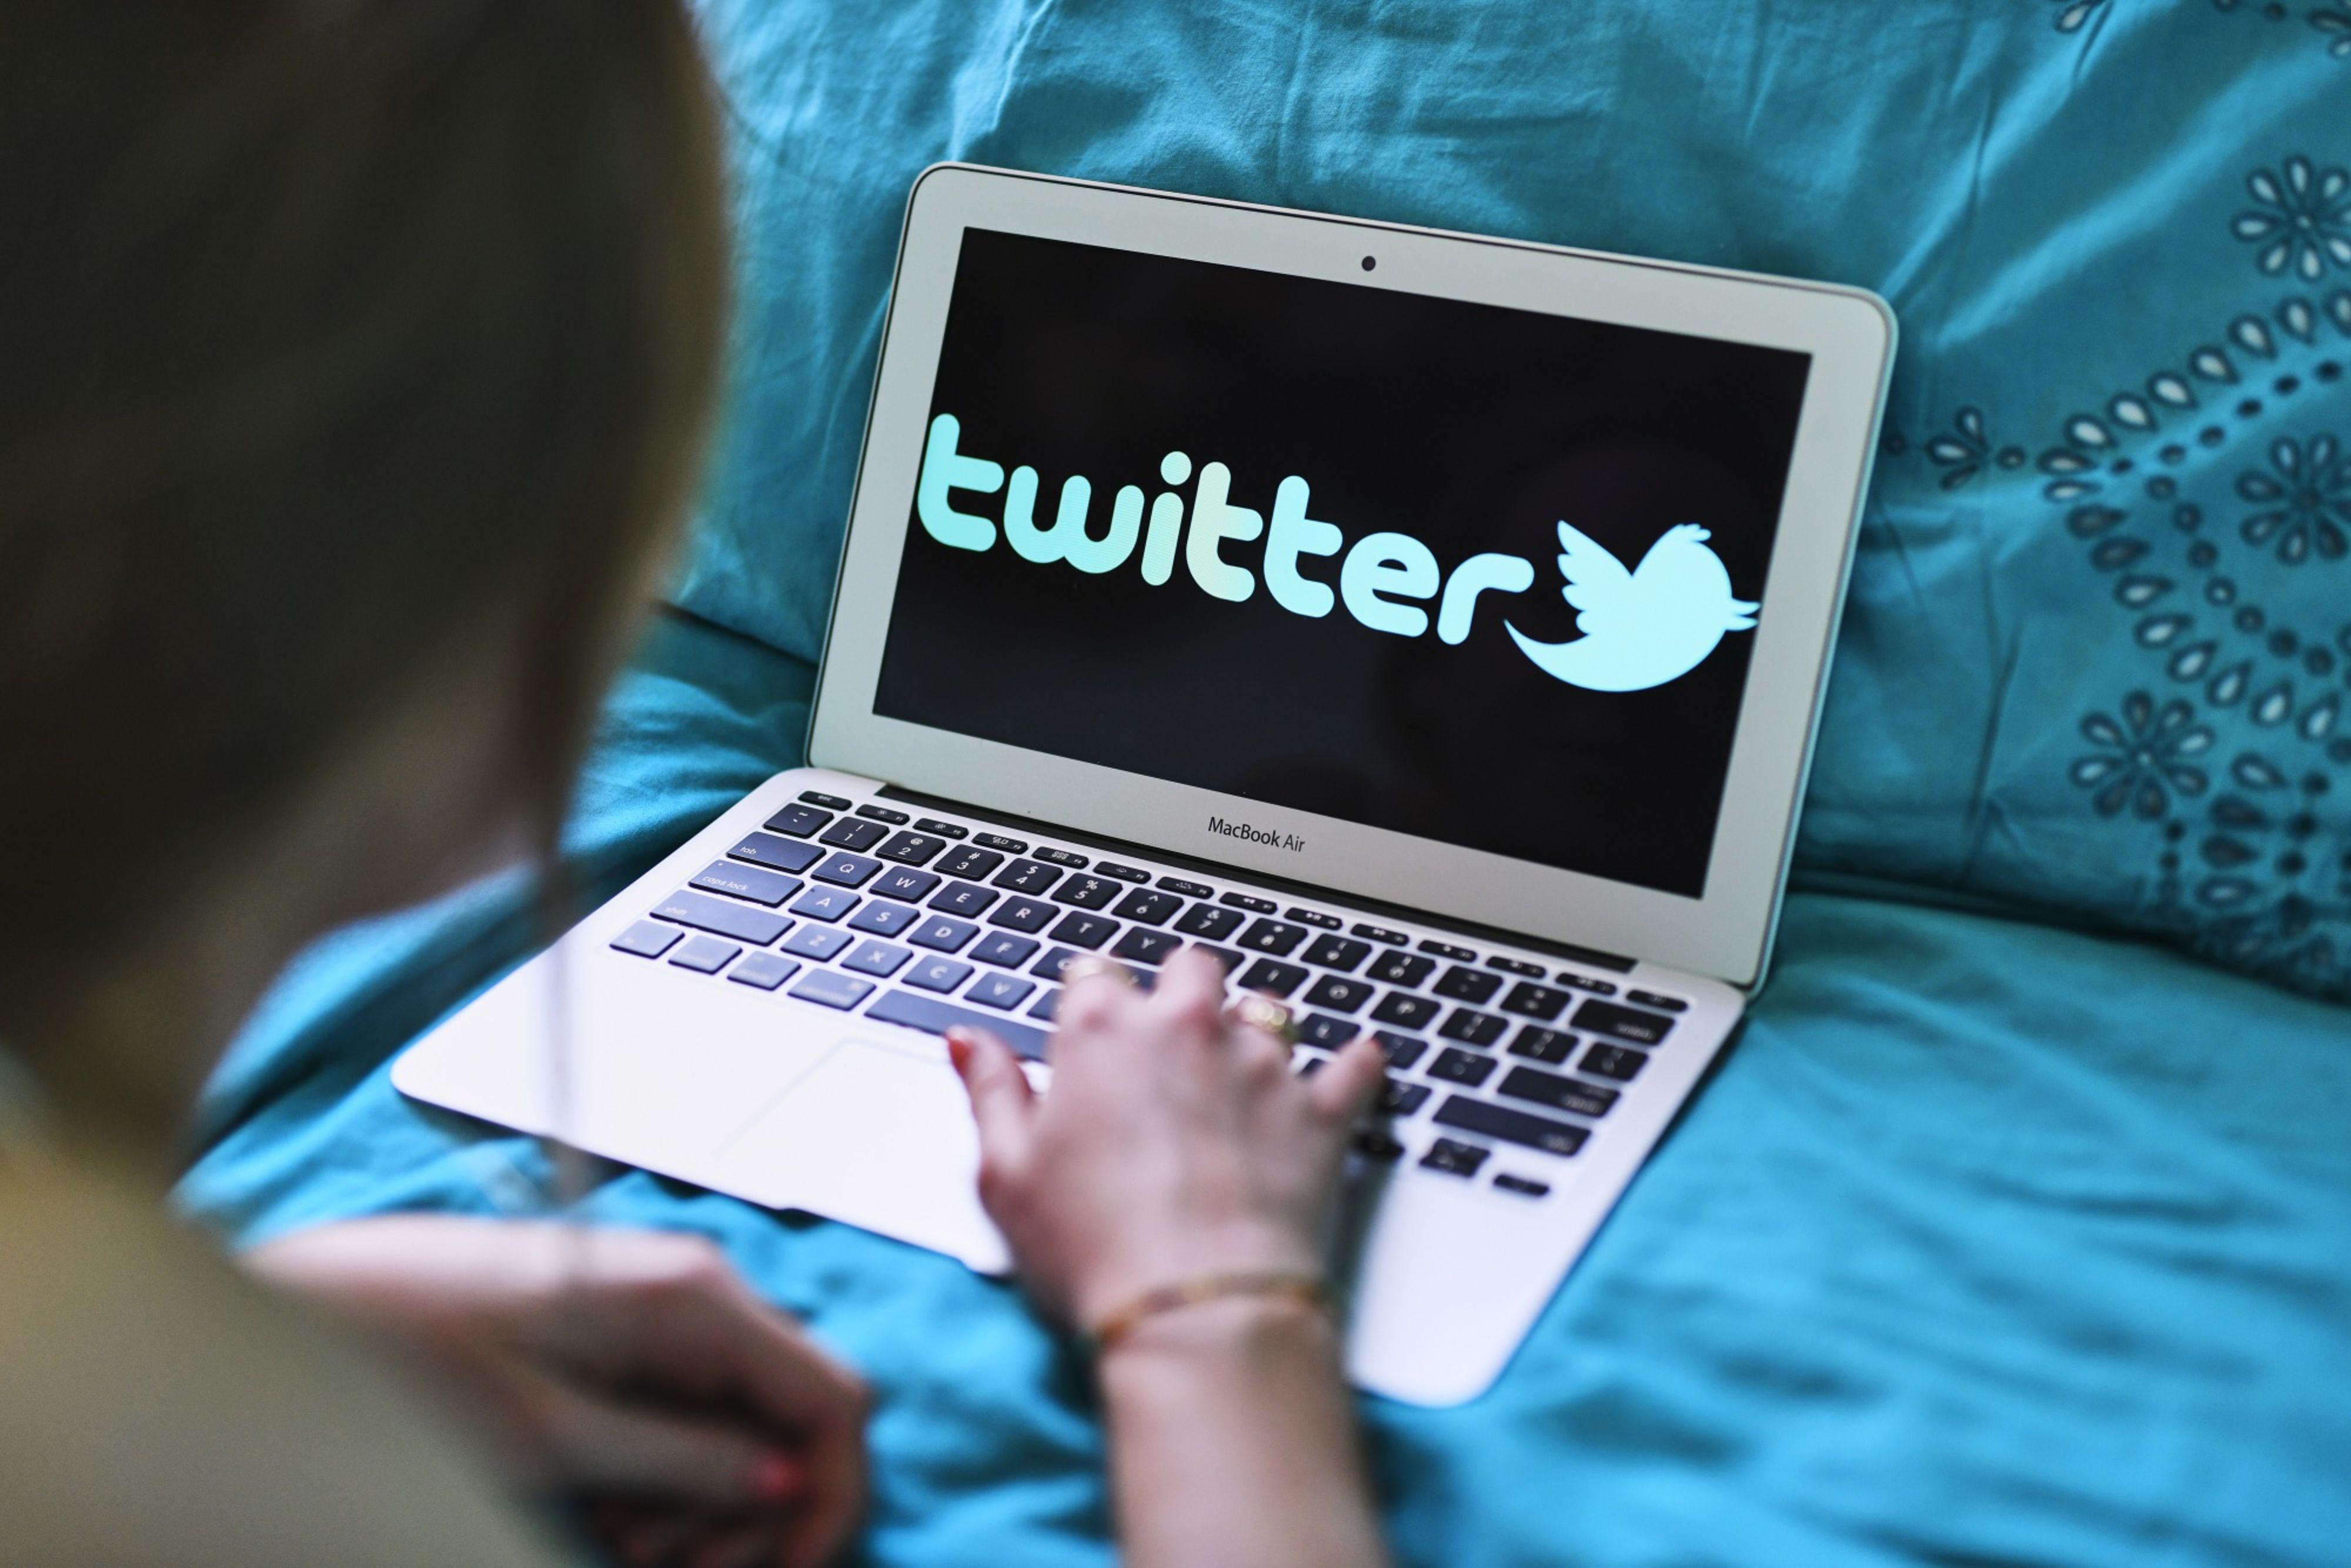 aljazeera.com - Turkey slaps advertising ban on Twitter with new social media law